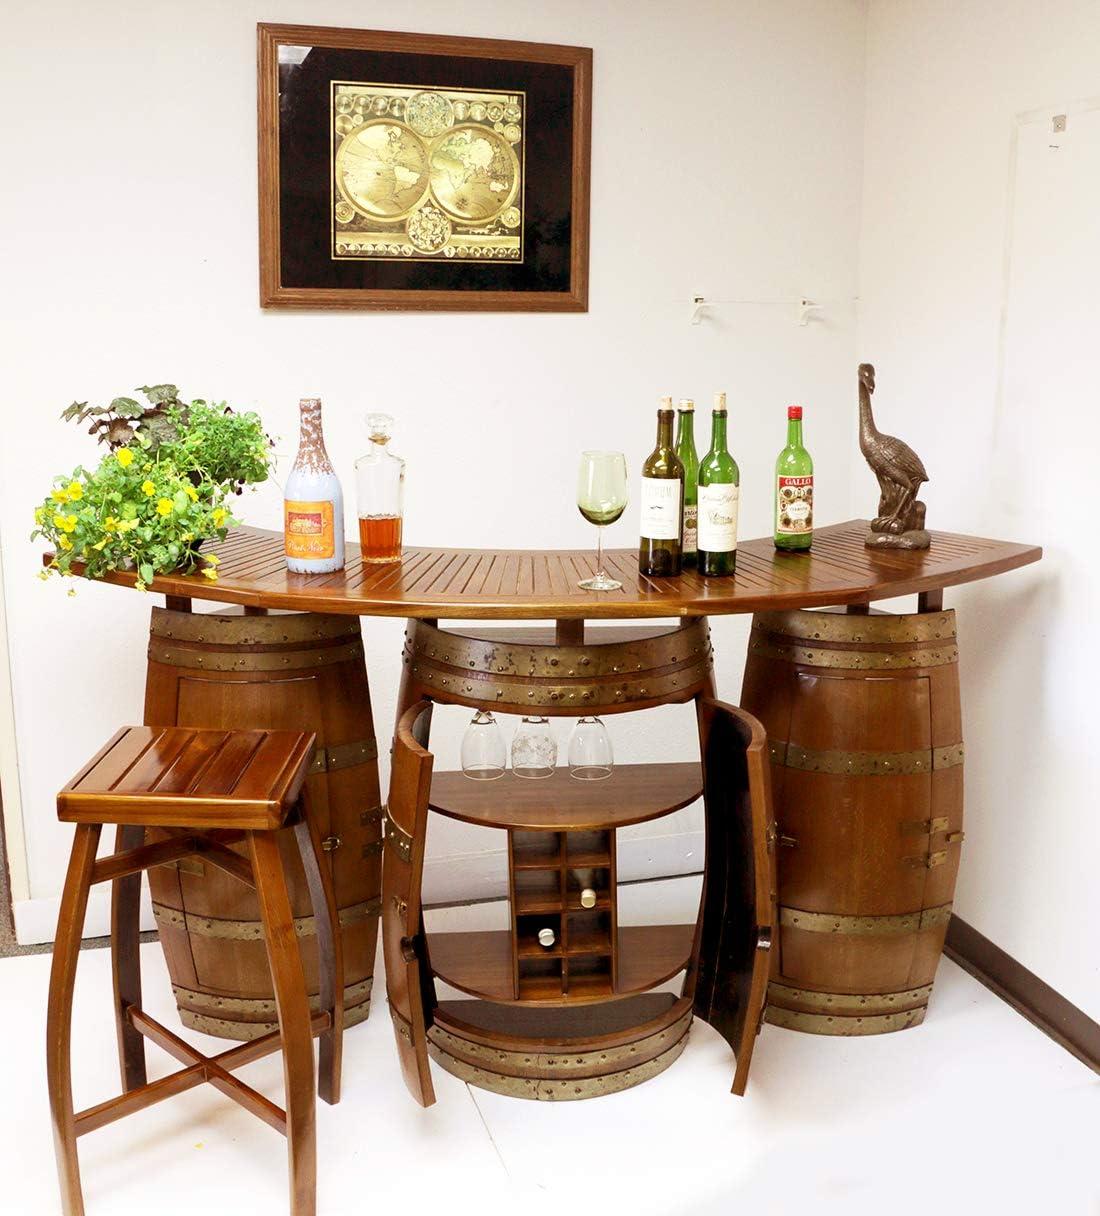 Amazon Com Mgp Oak Wood Wine Barrel Bar With 6 Ft Teak Wood Foldable Bar Counter 72 L X 24 D X 42 H Kitchen Dining